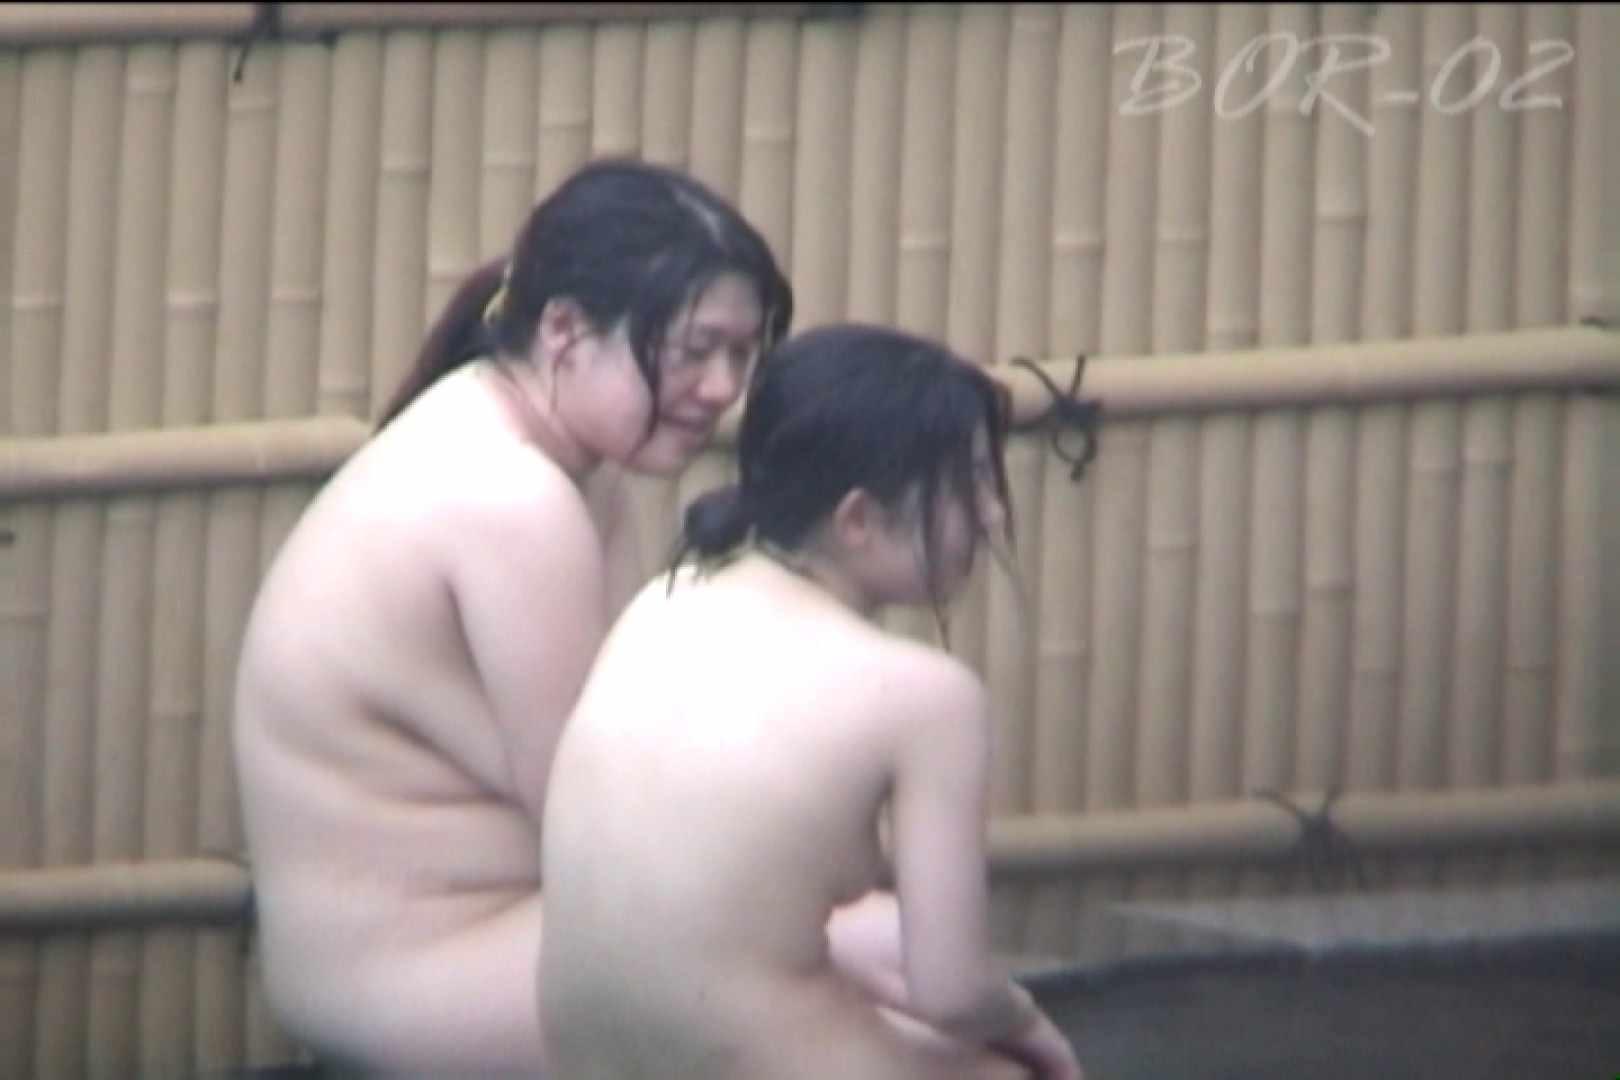 Aquaな露天風呂Vol.471 盗撮 | HなOL  66pic 56